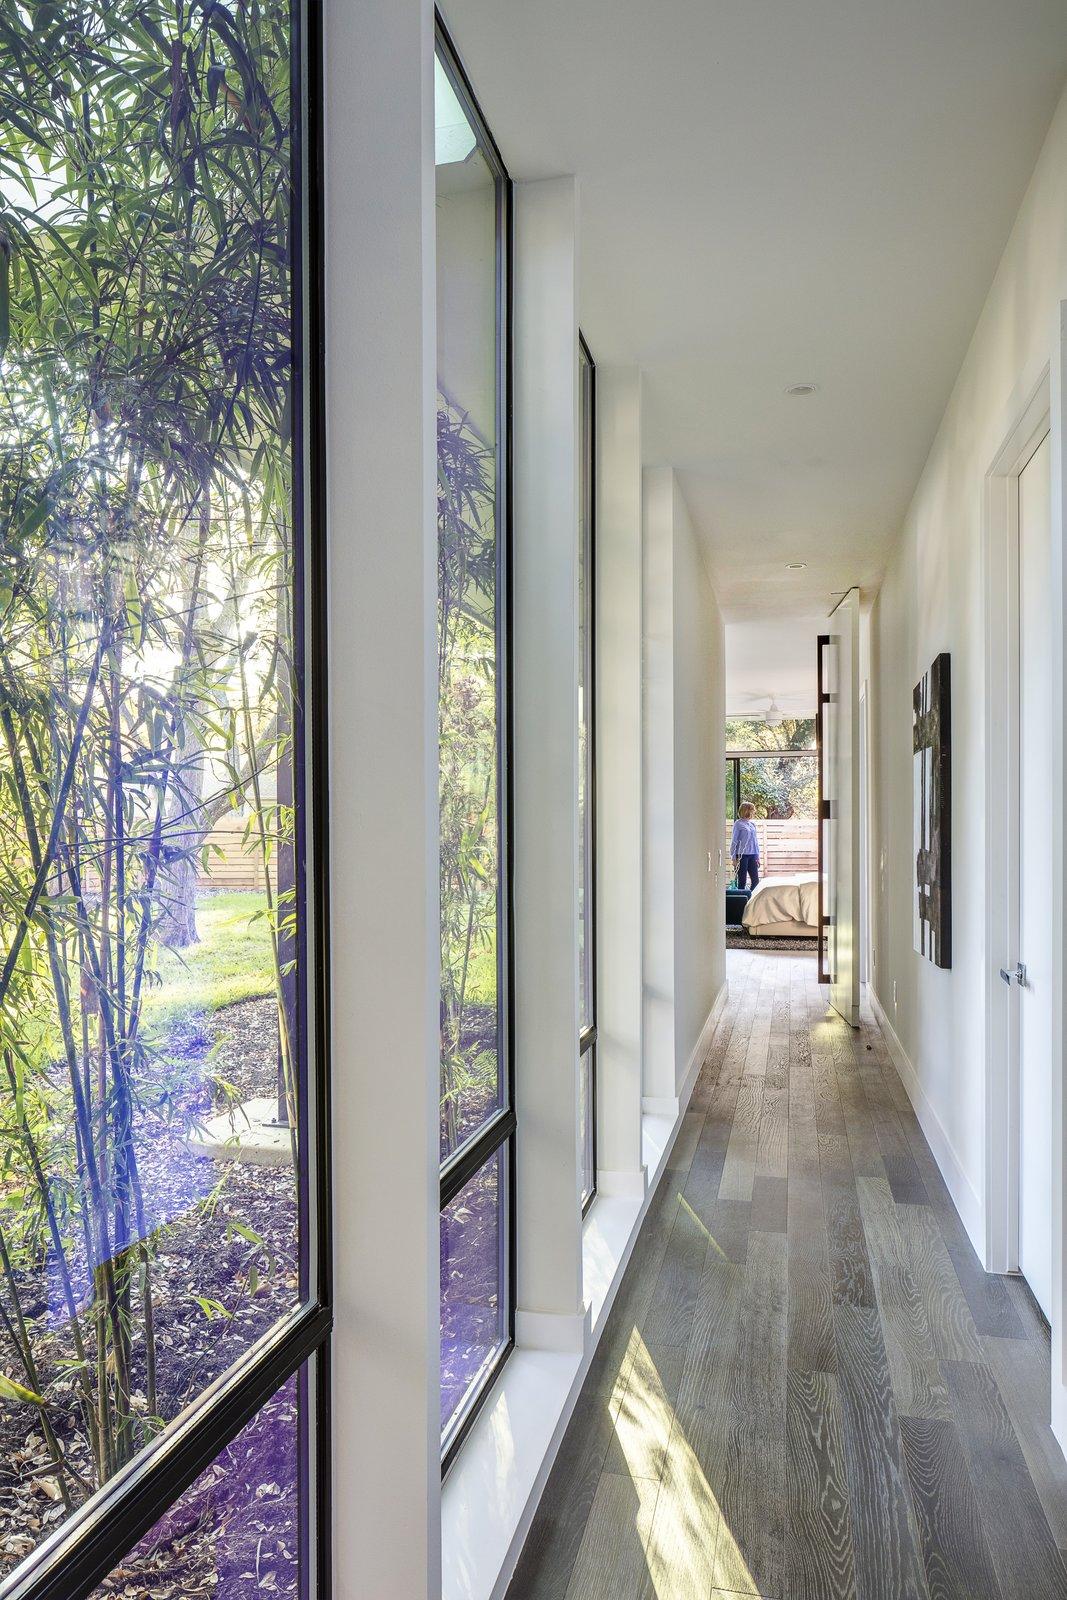 Strass Residence by Matt Fajkus Architecture | Photography: Atelier Wong Photography  Strass Residence